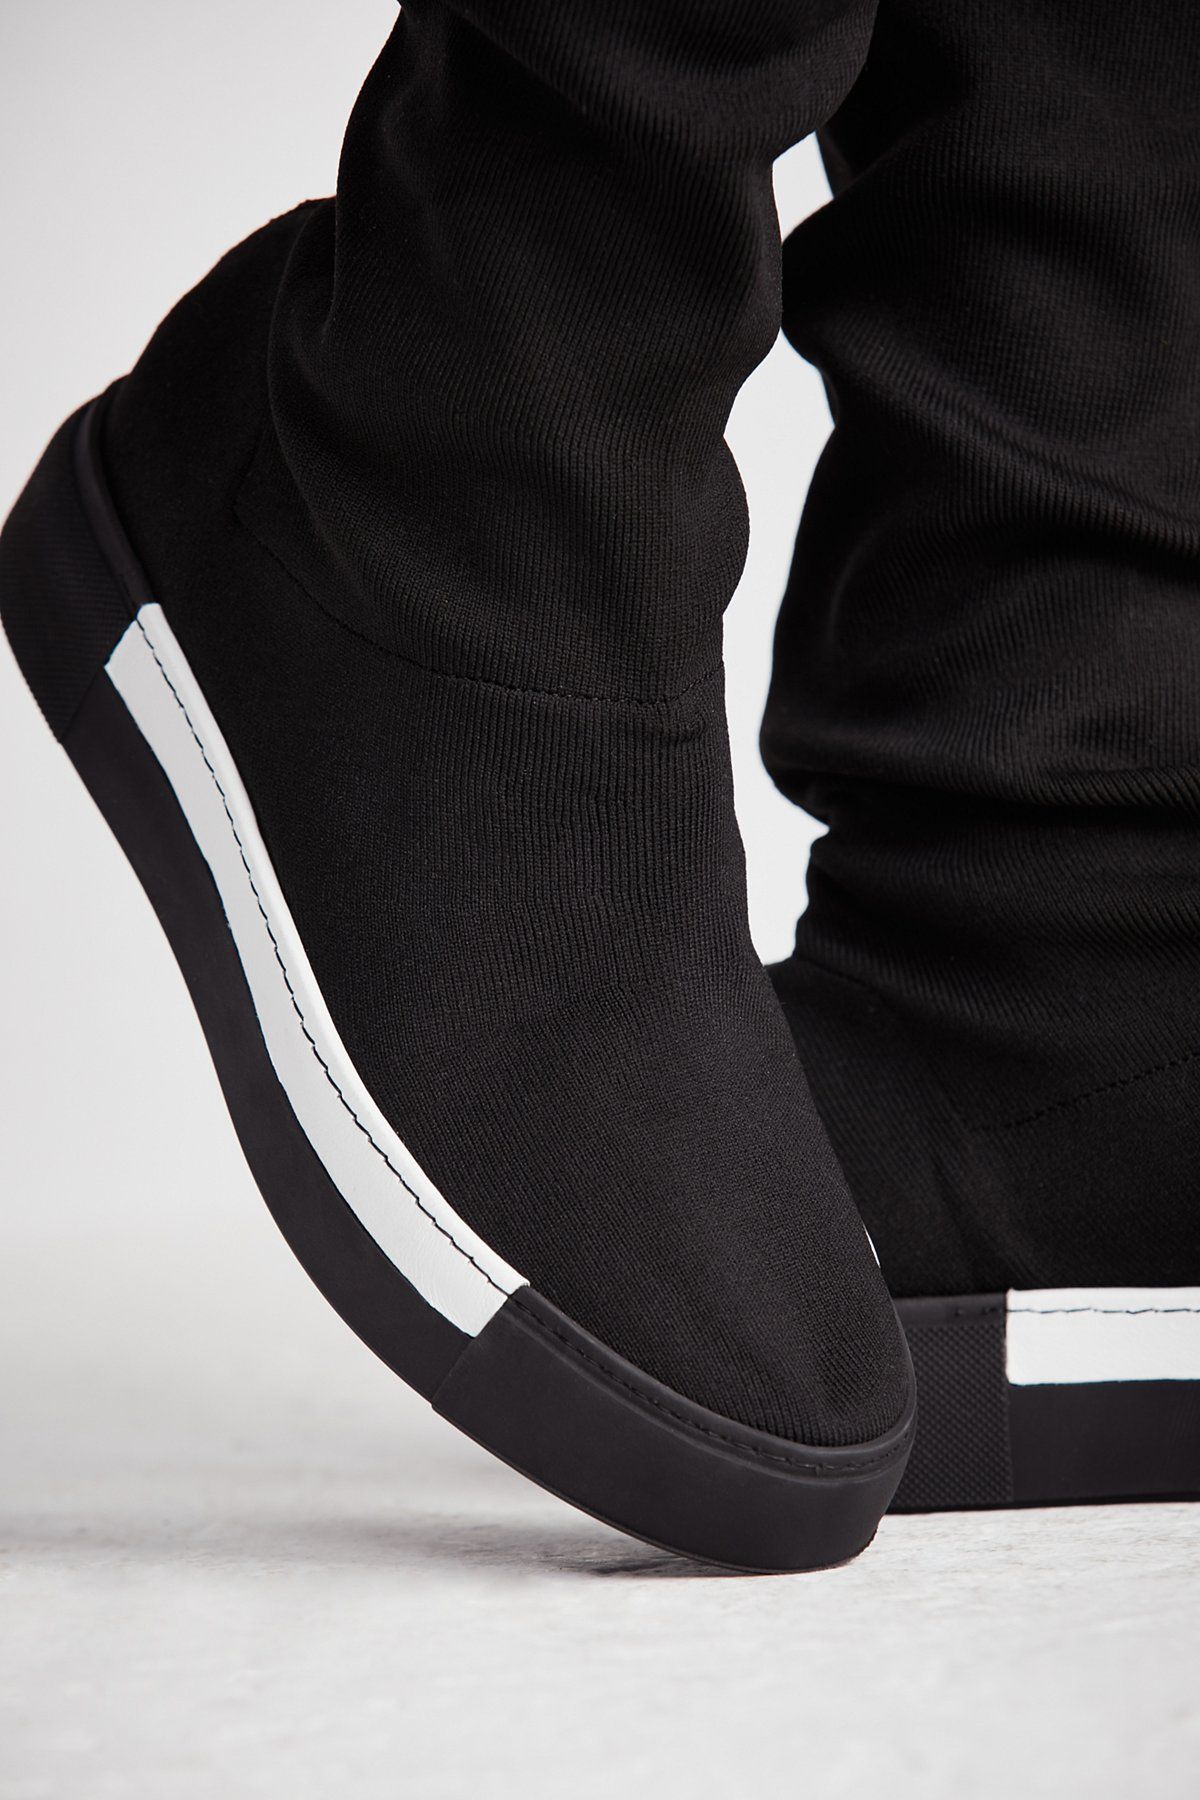 Chaussures - Tribunaux De Plate-forme Alberto Venturini YkPZN